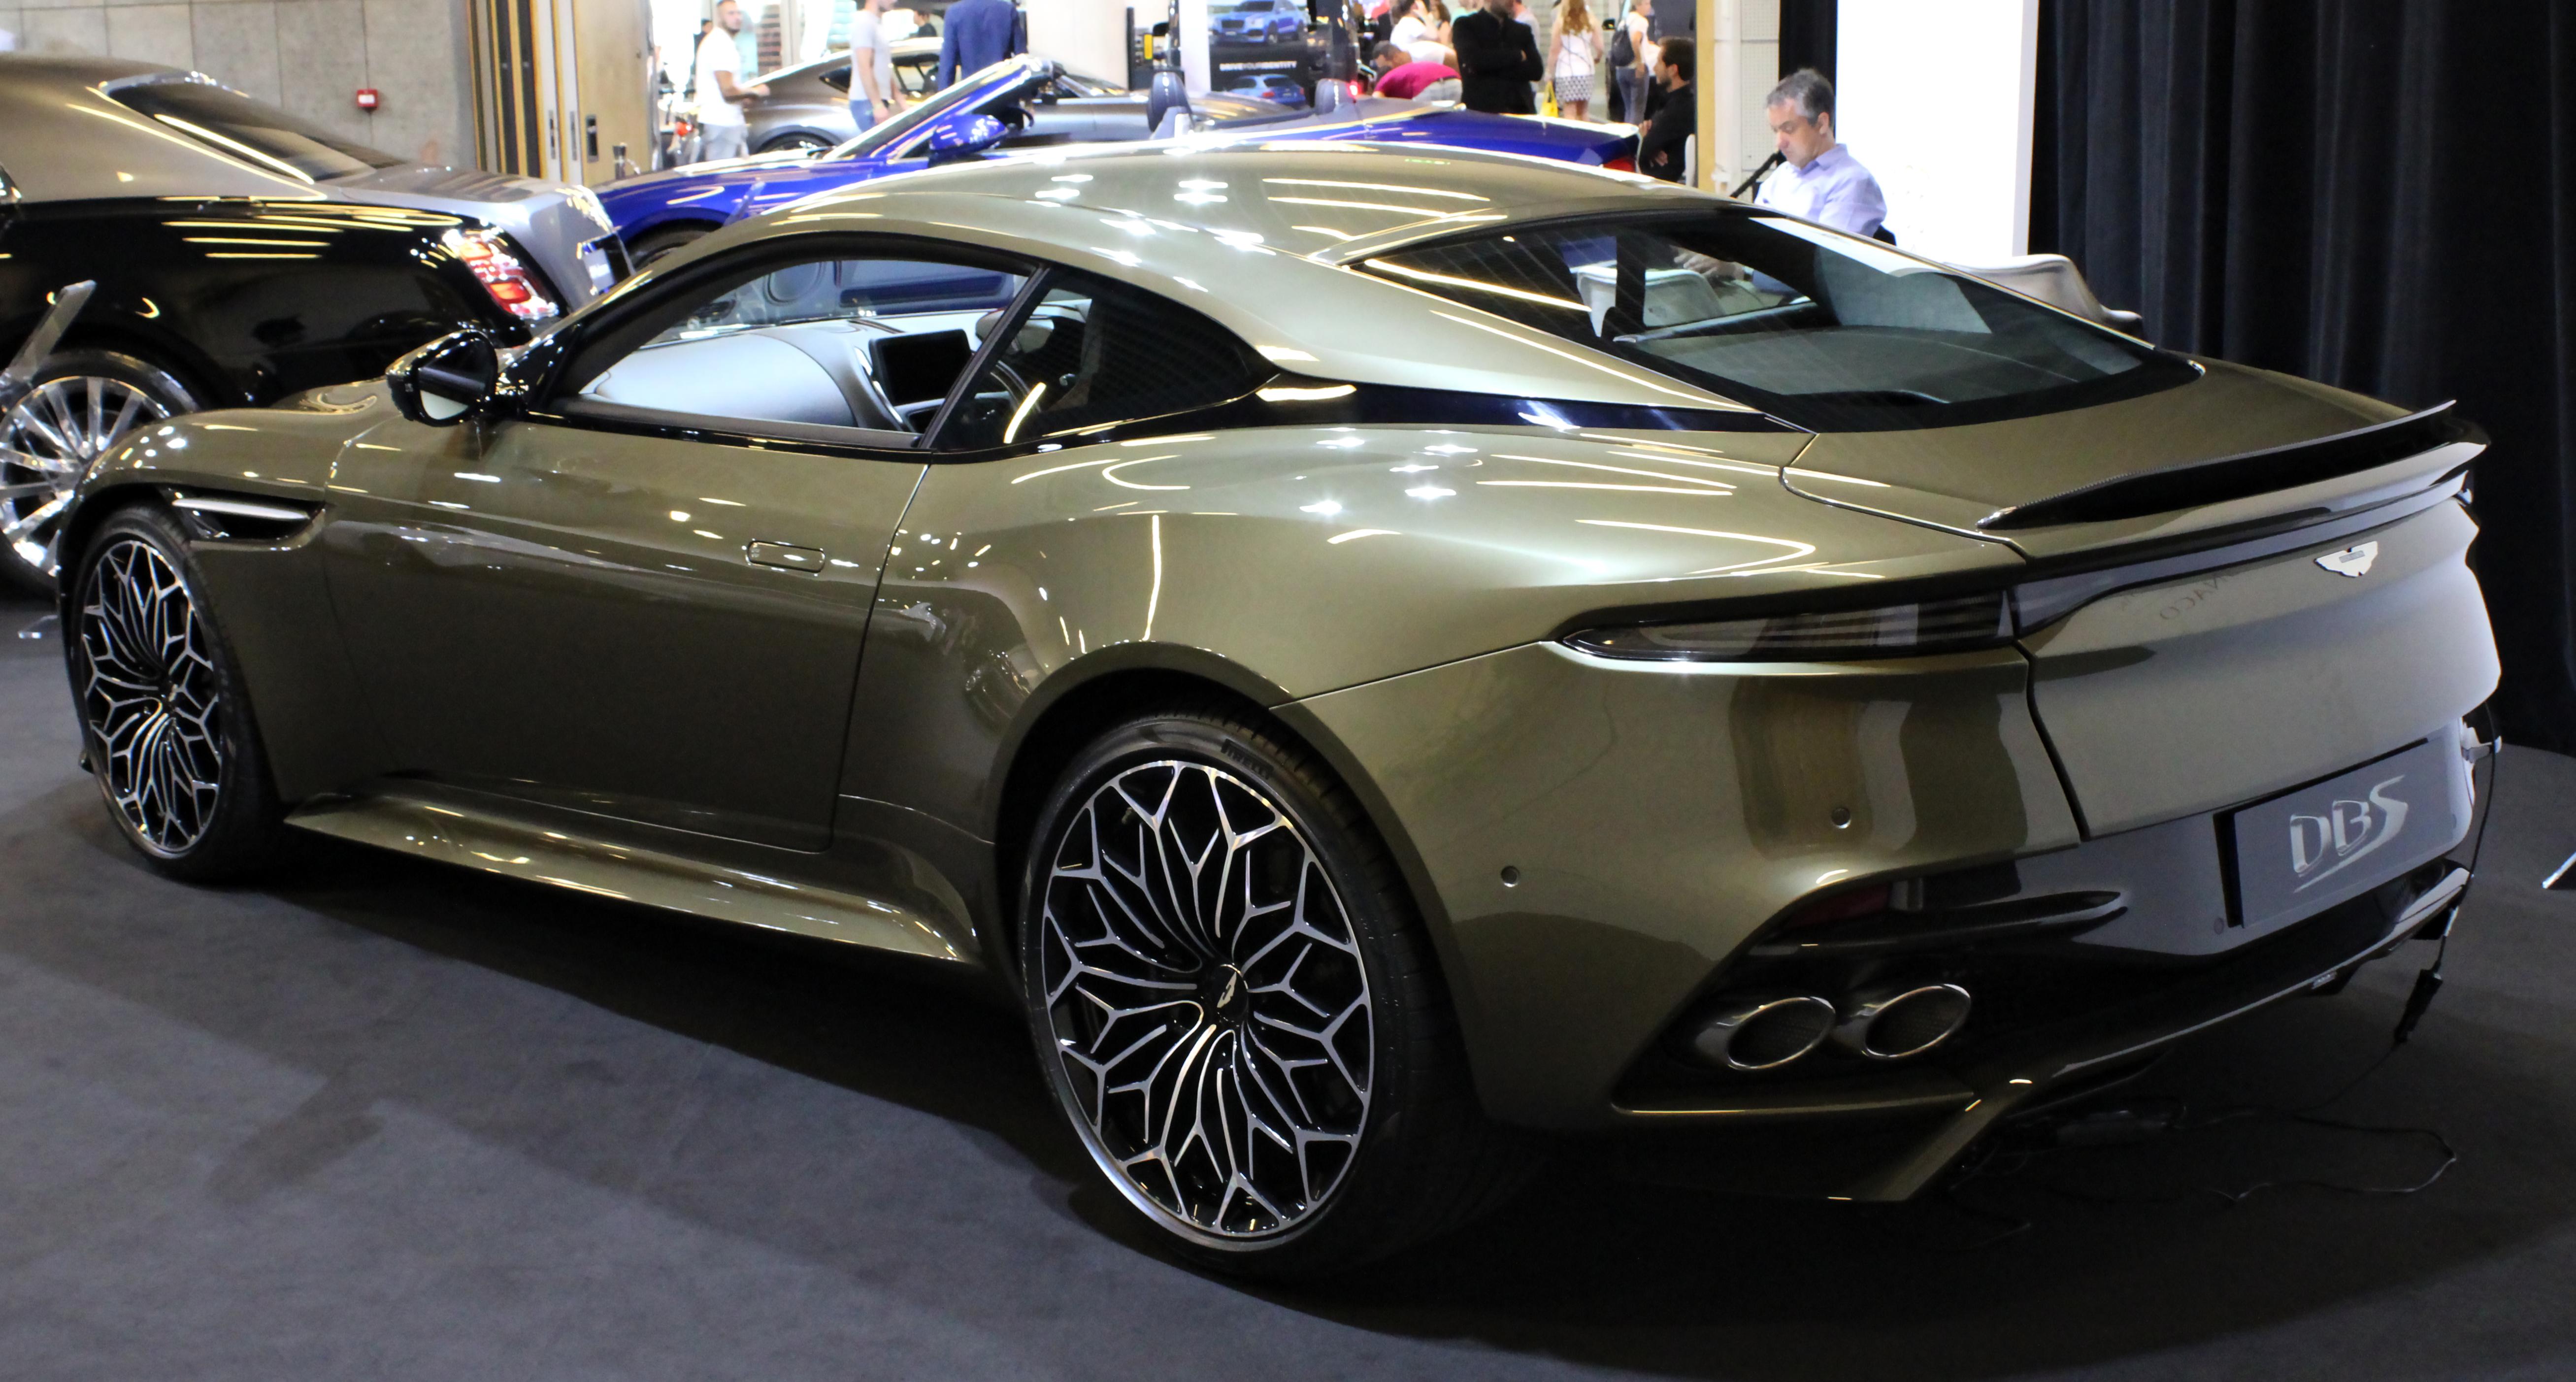 Datei Aston Martin Dbs Superleggera Ohmss Top Marques 2019 Img 1063 Jpg Wikipedia